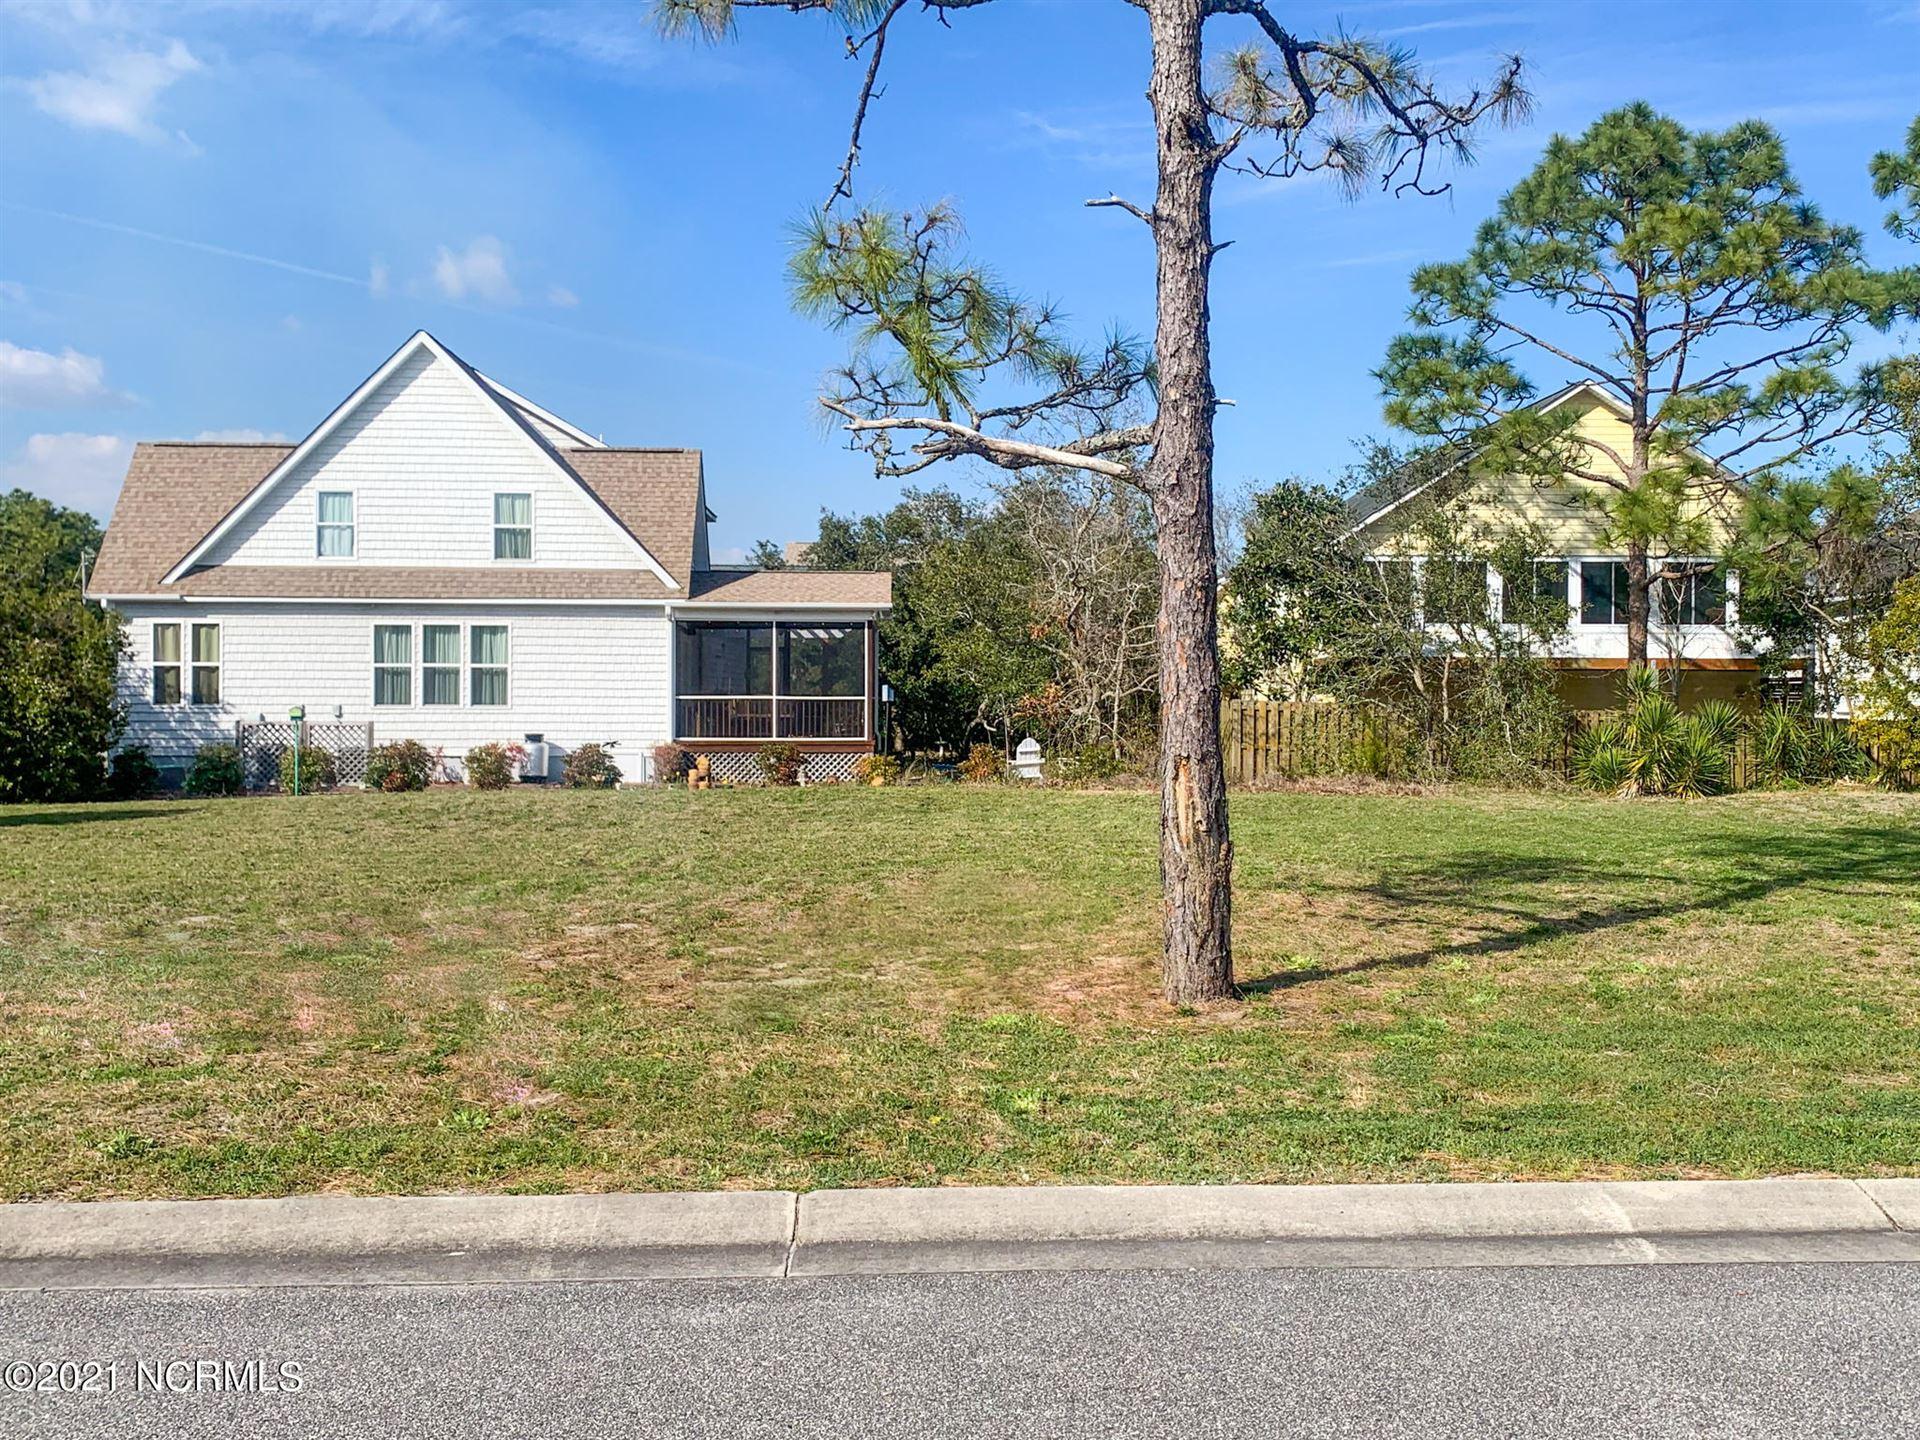 Photo of 103 Island Palms Drive, Carolina Beach, NC 28428 (MLS # 100260896)